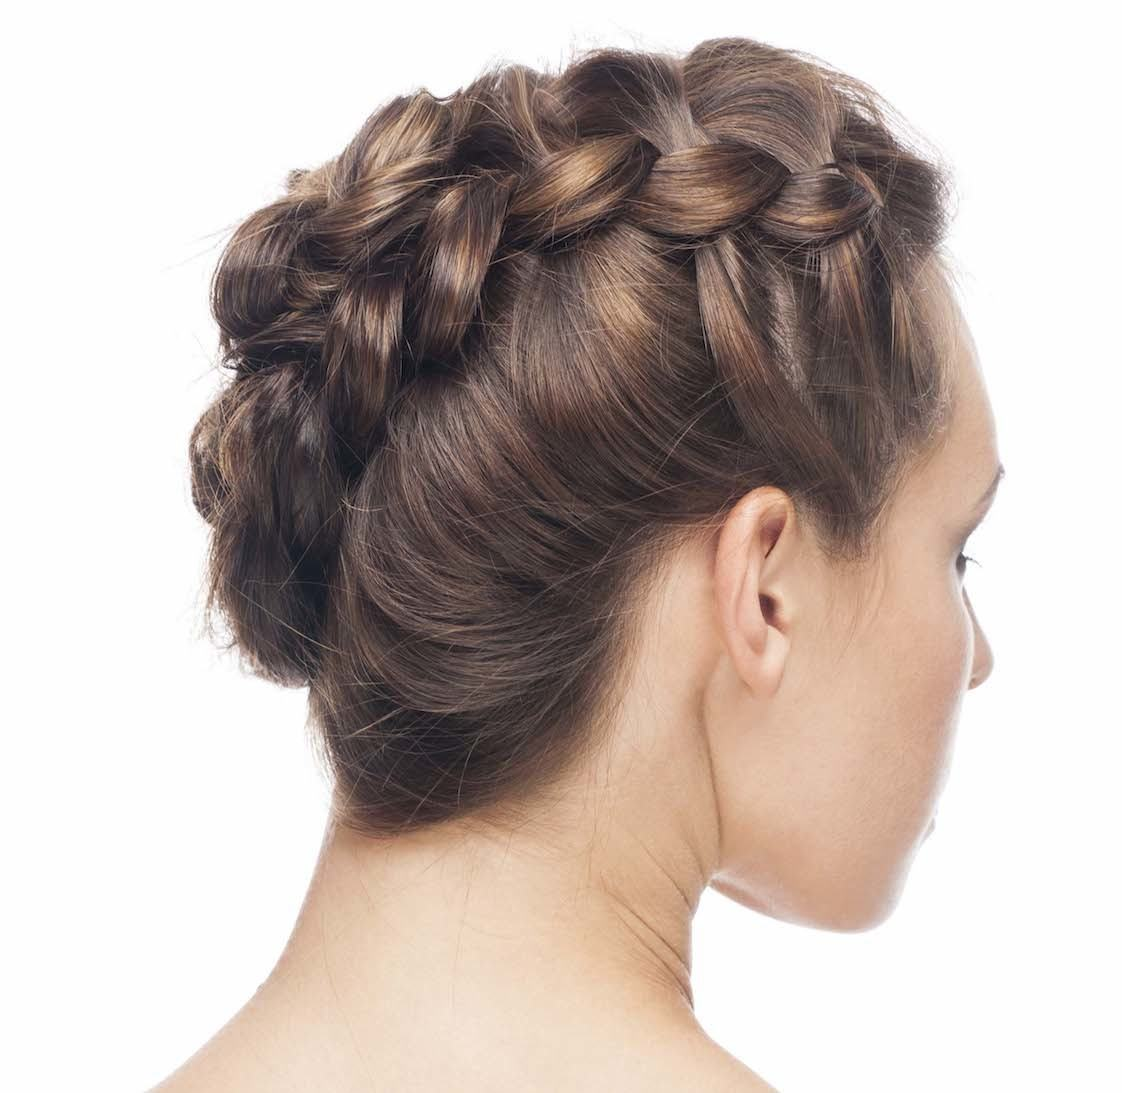 Model Kepang Rambut Pendek Untuk Tampilan Modern All Things Hair - Gaya rambut pendek kepang